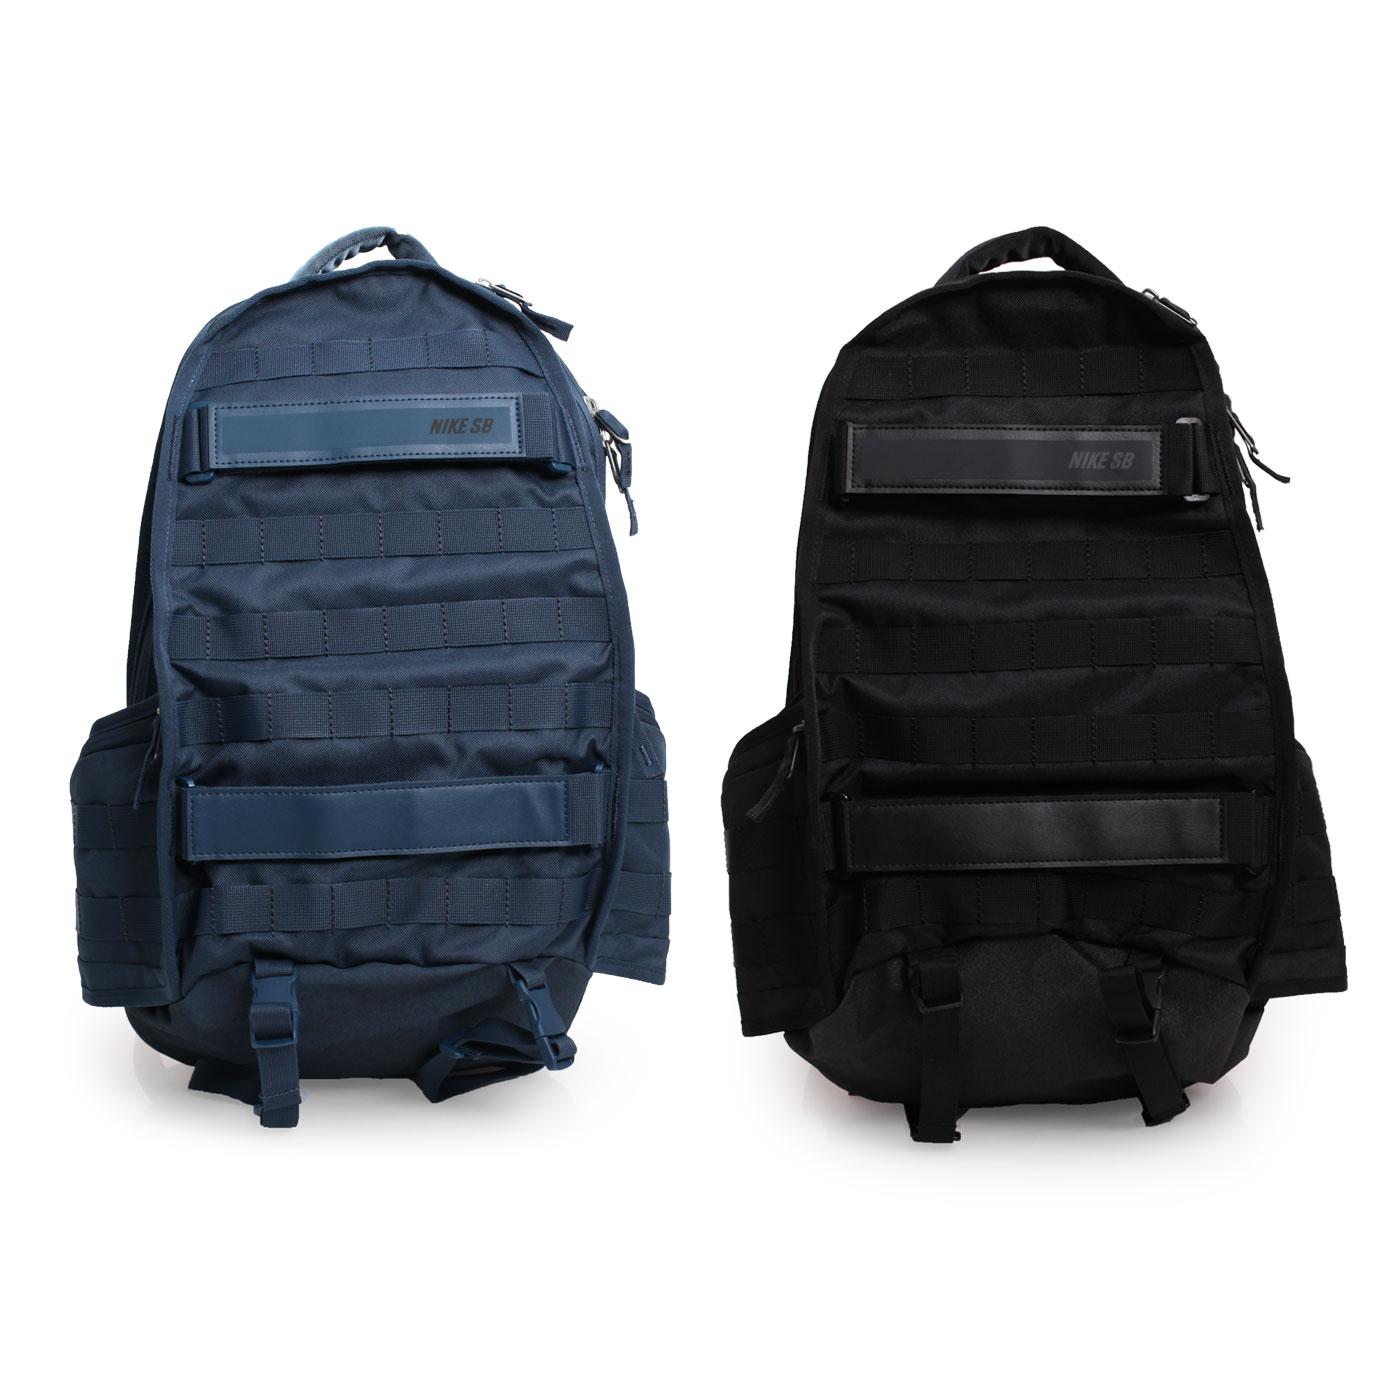 NIKE SB RPM背包(免運 滑板 後背包 雙肩包 旅行【05481023】≡排汗專家≡